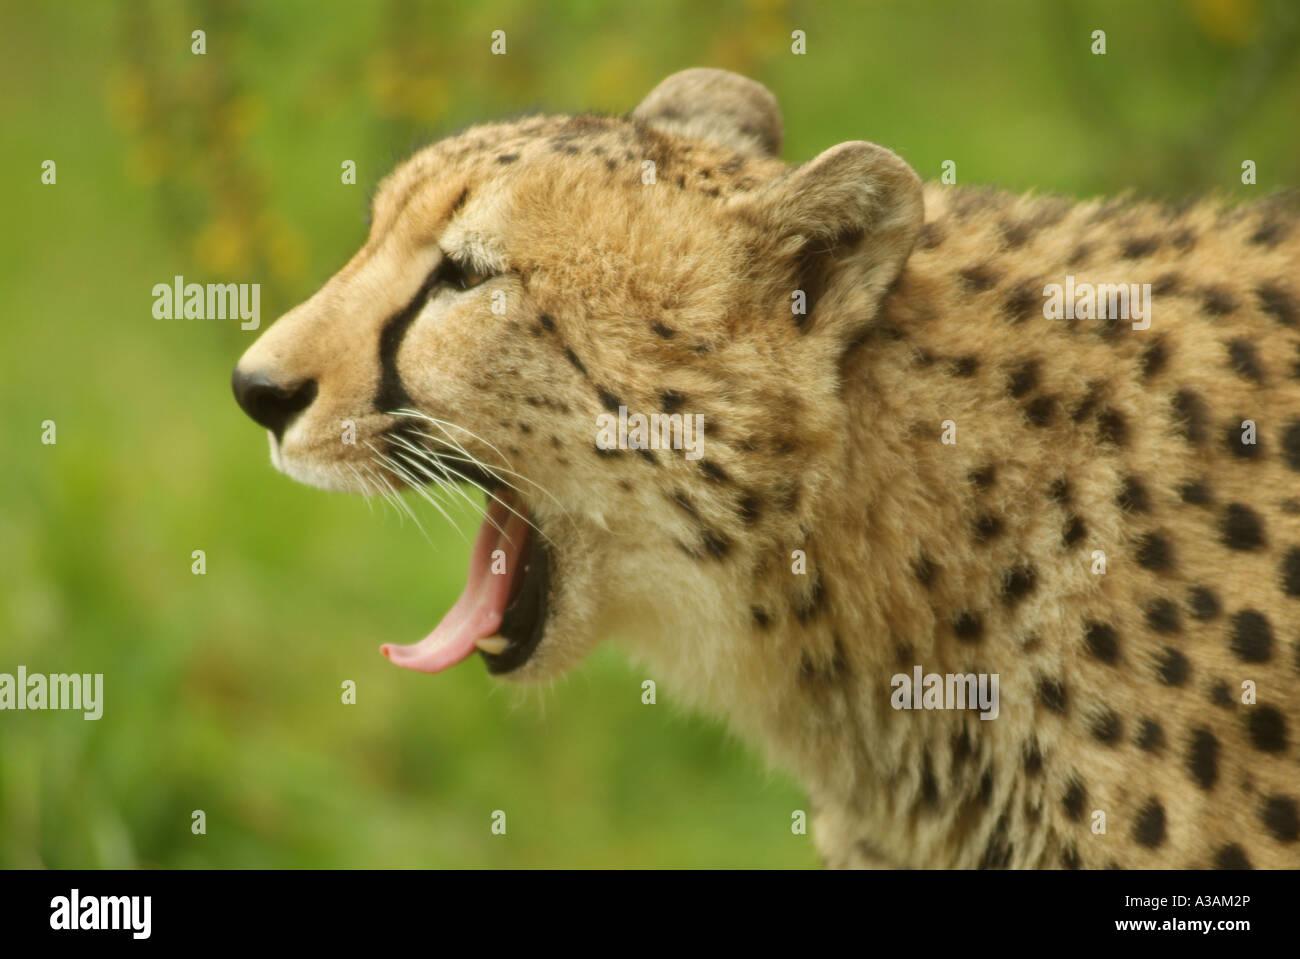 Cheetah yawning (Acinonyx jubatus) - Stock Image